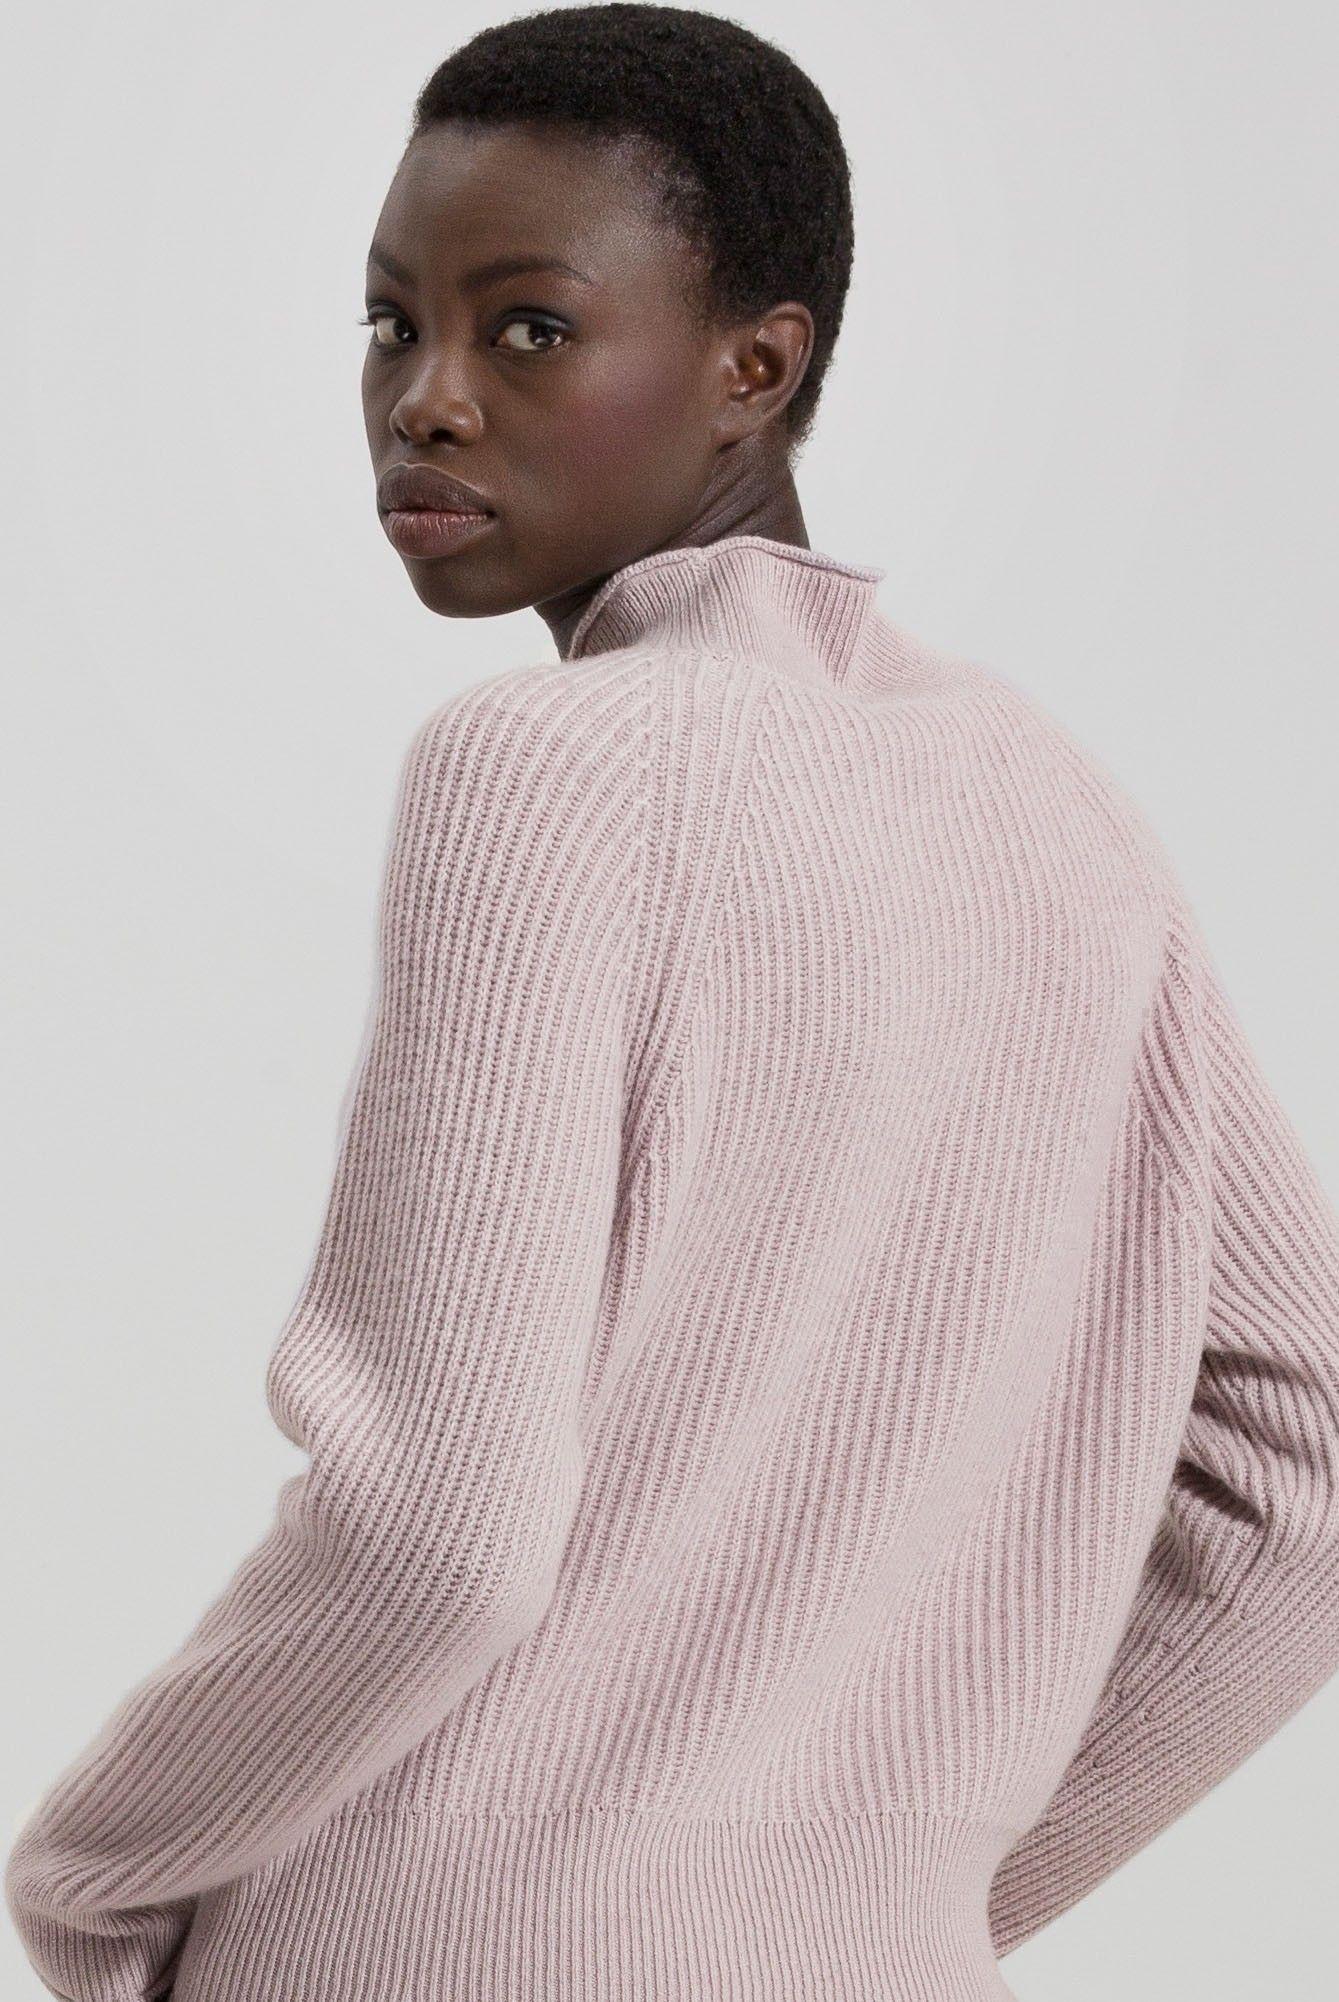 LUISA CERANO - Damenpullover - Ripprolli aus Woll-Mix - Blush Rose